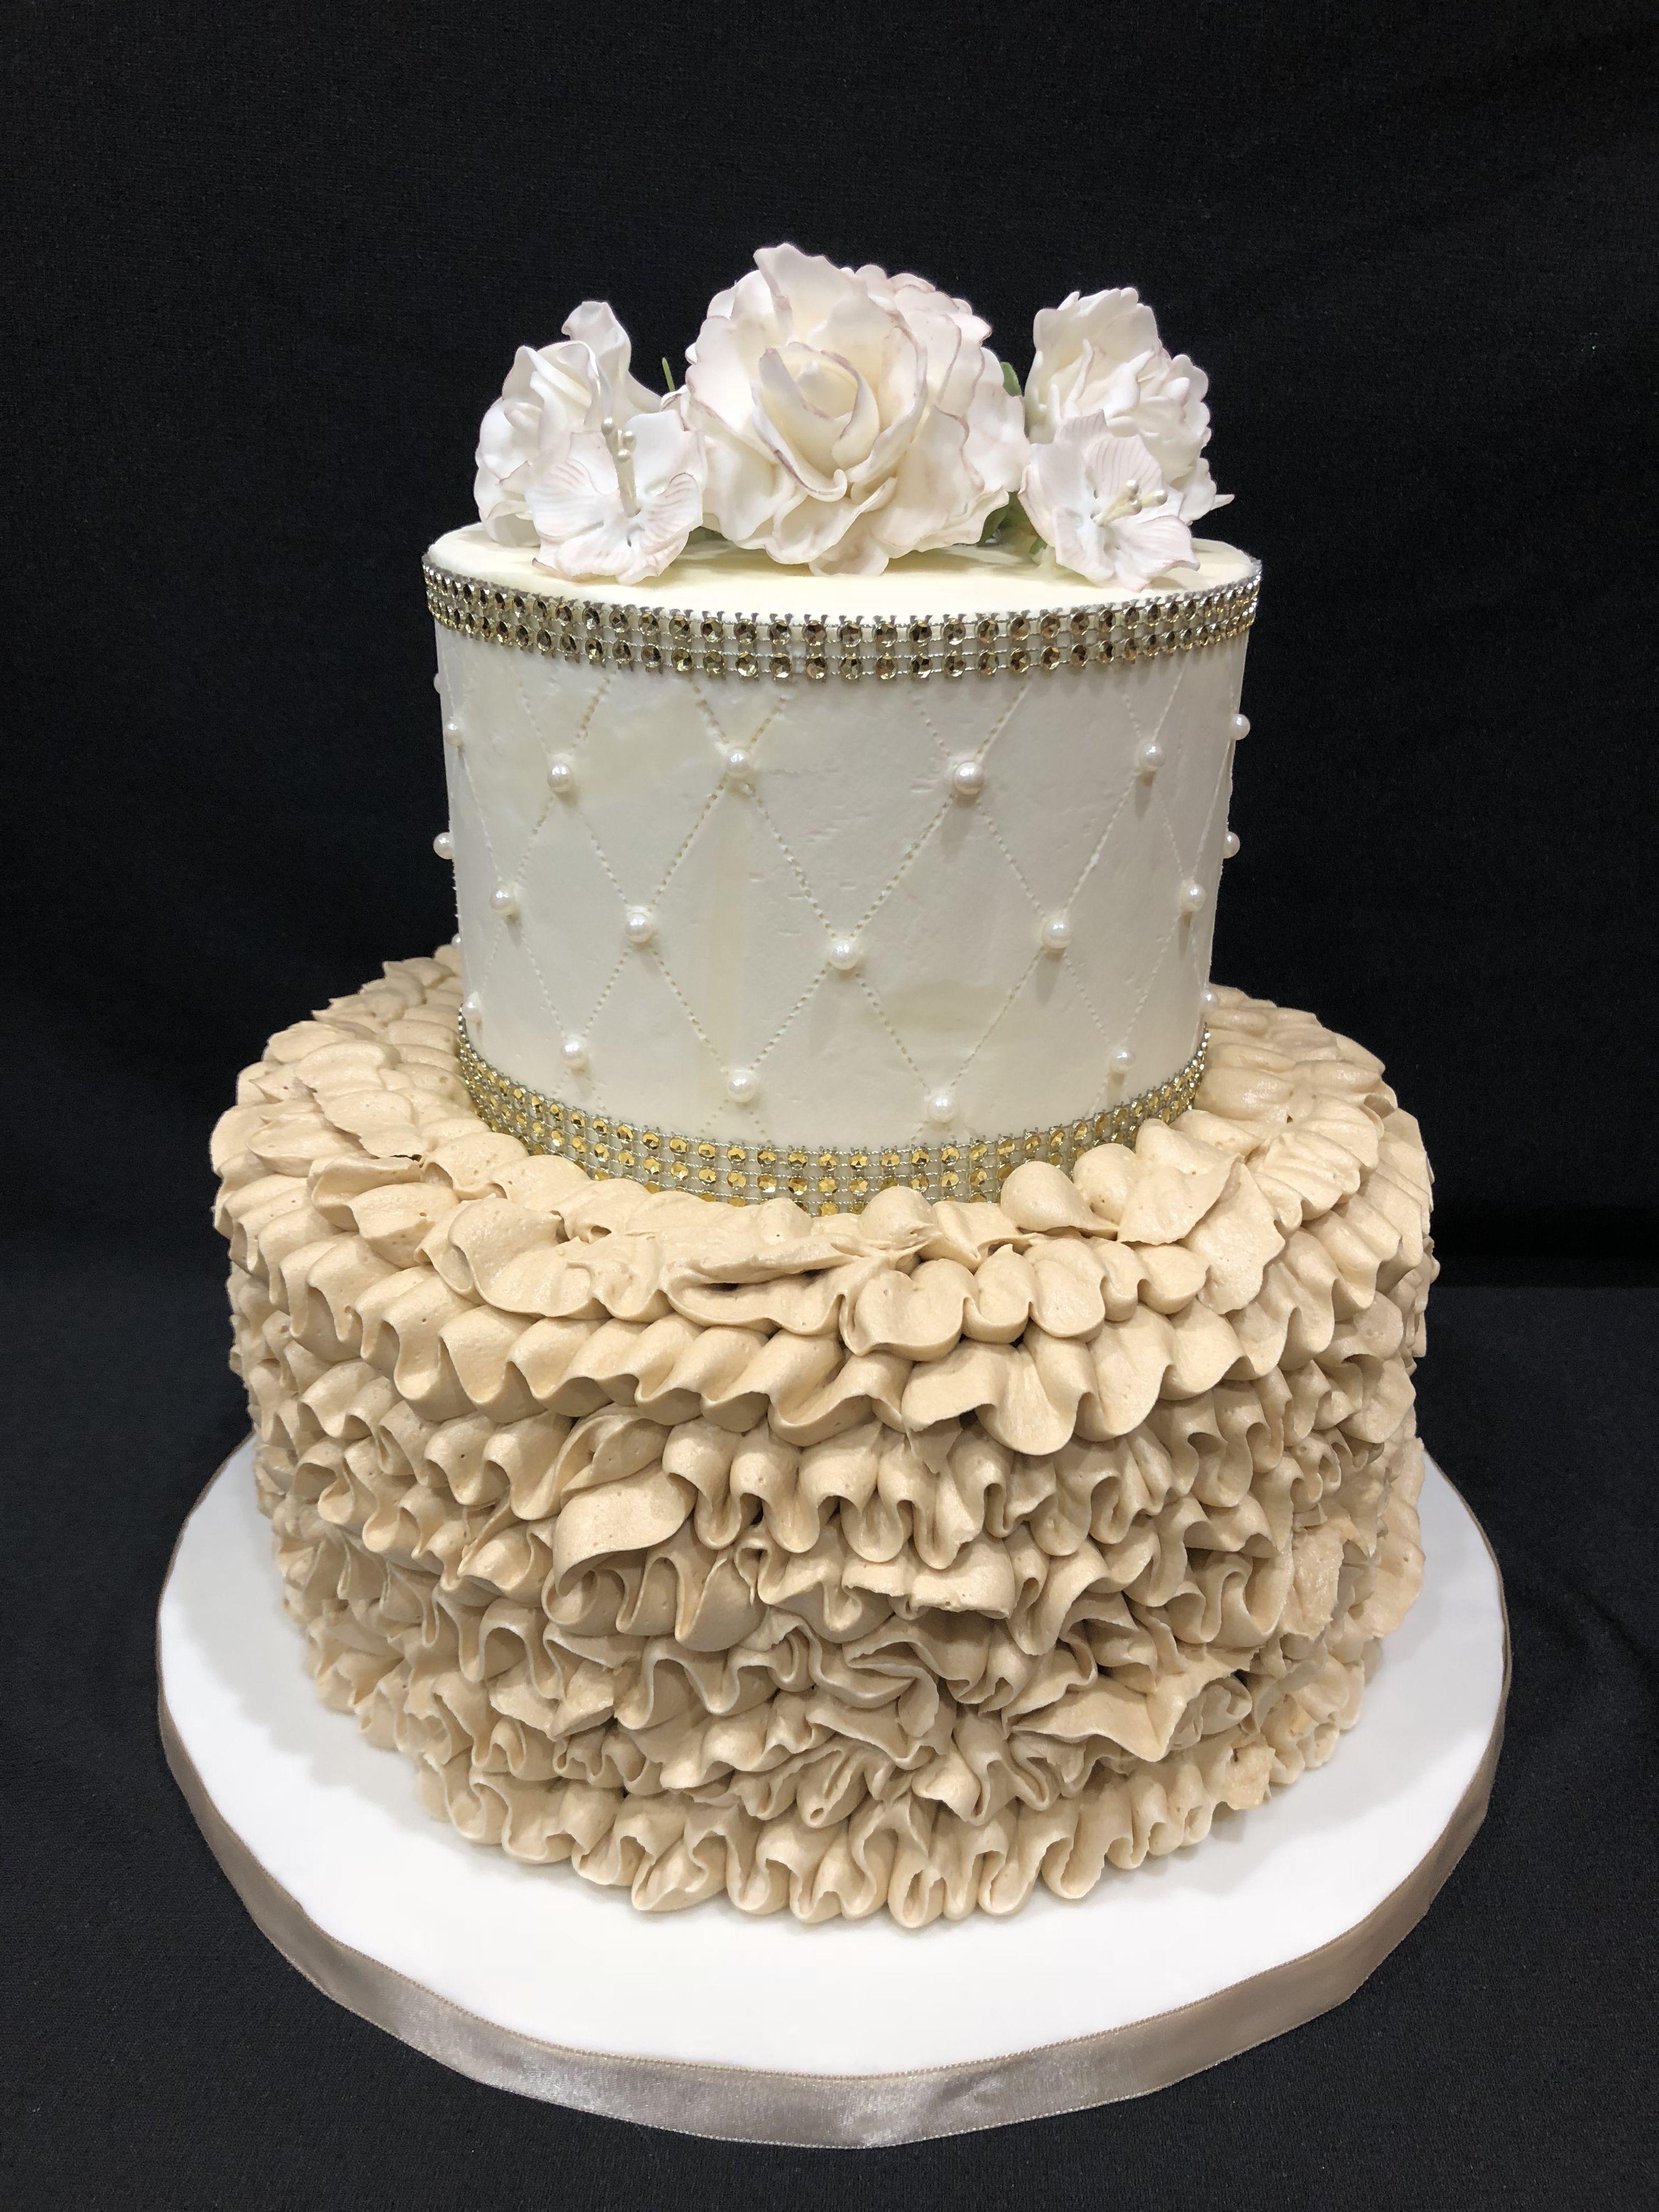 Elegant white and ivory cake ruffles and flowers